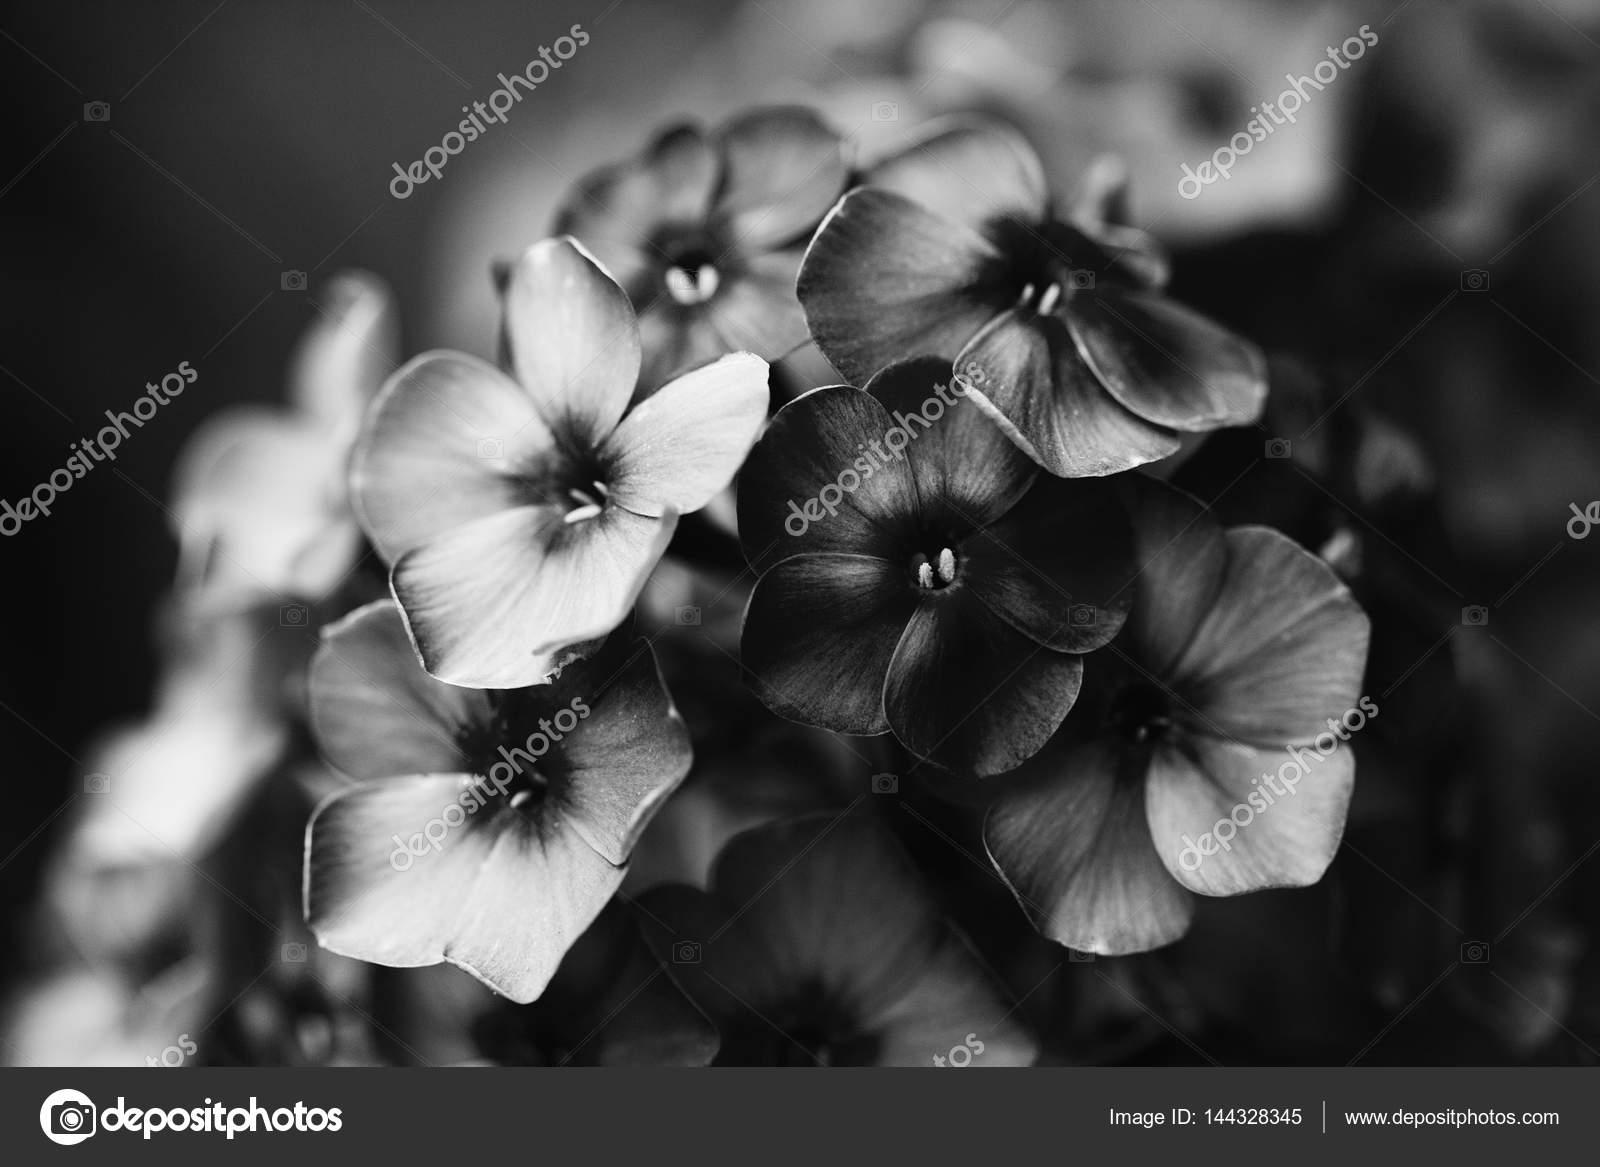 Black White Photo Beautiful Phlox Violet Flowers Noisy Film Camera